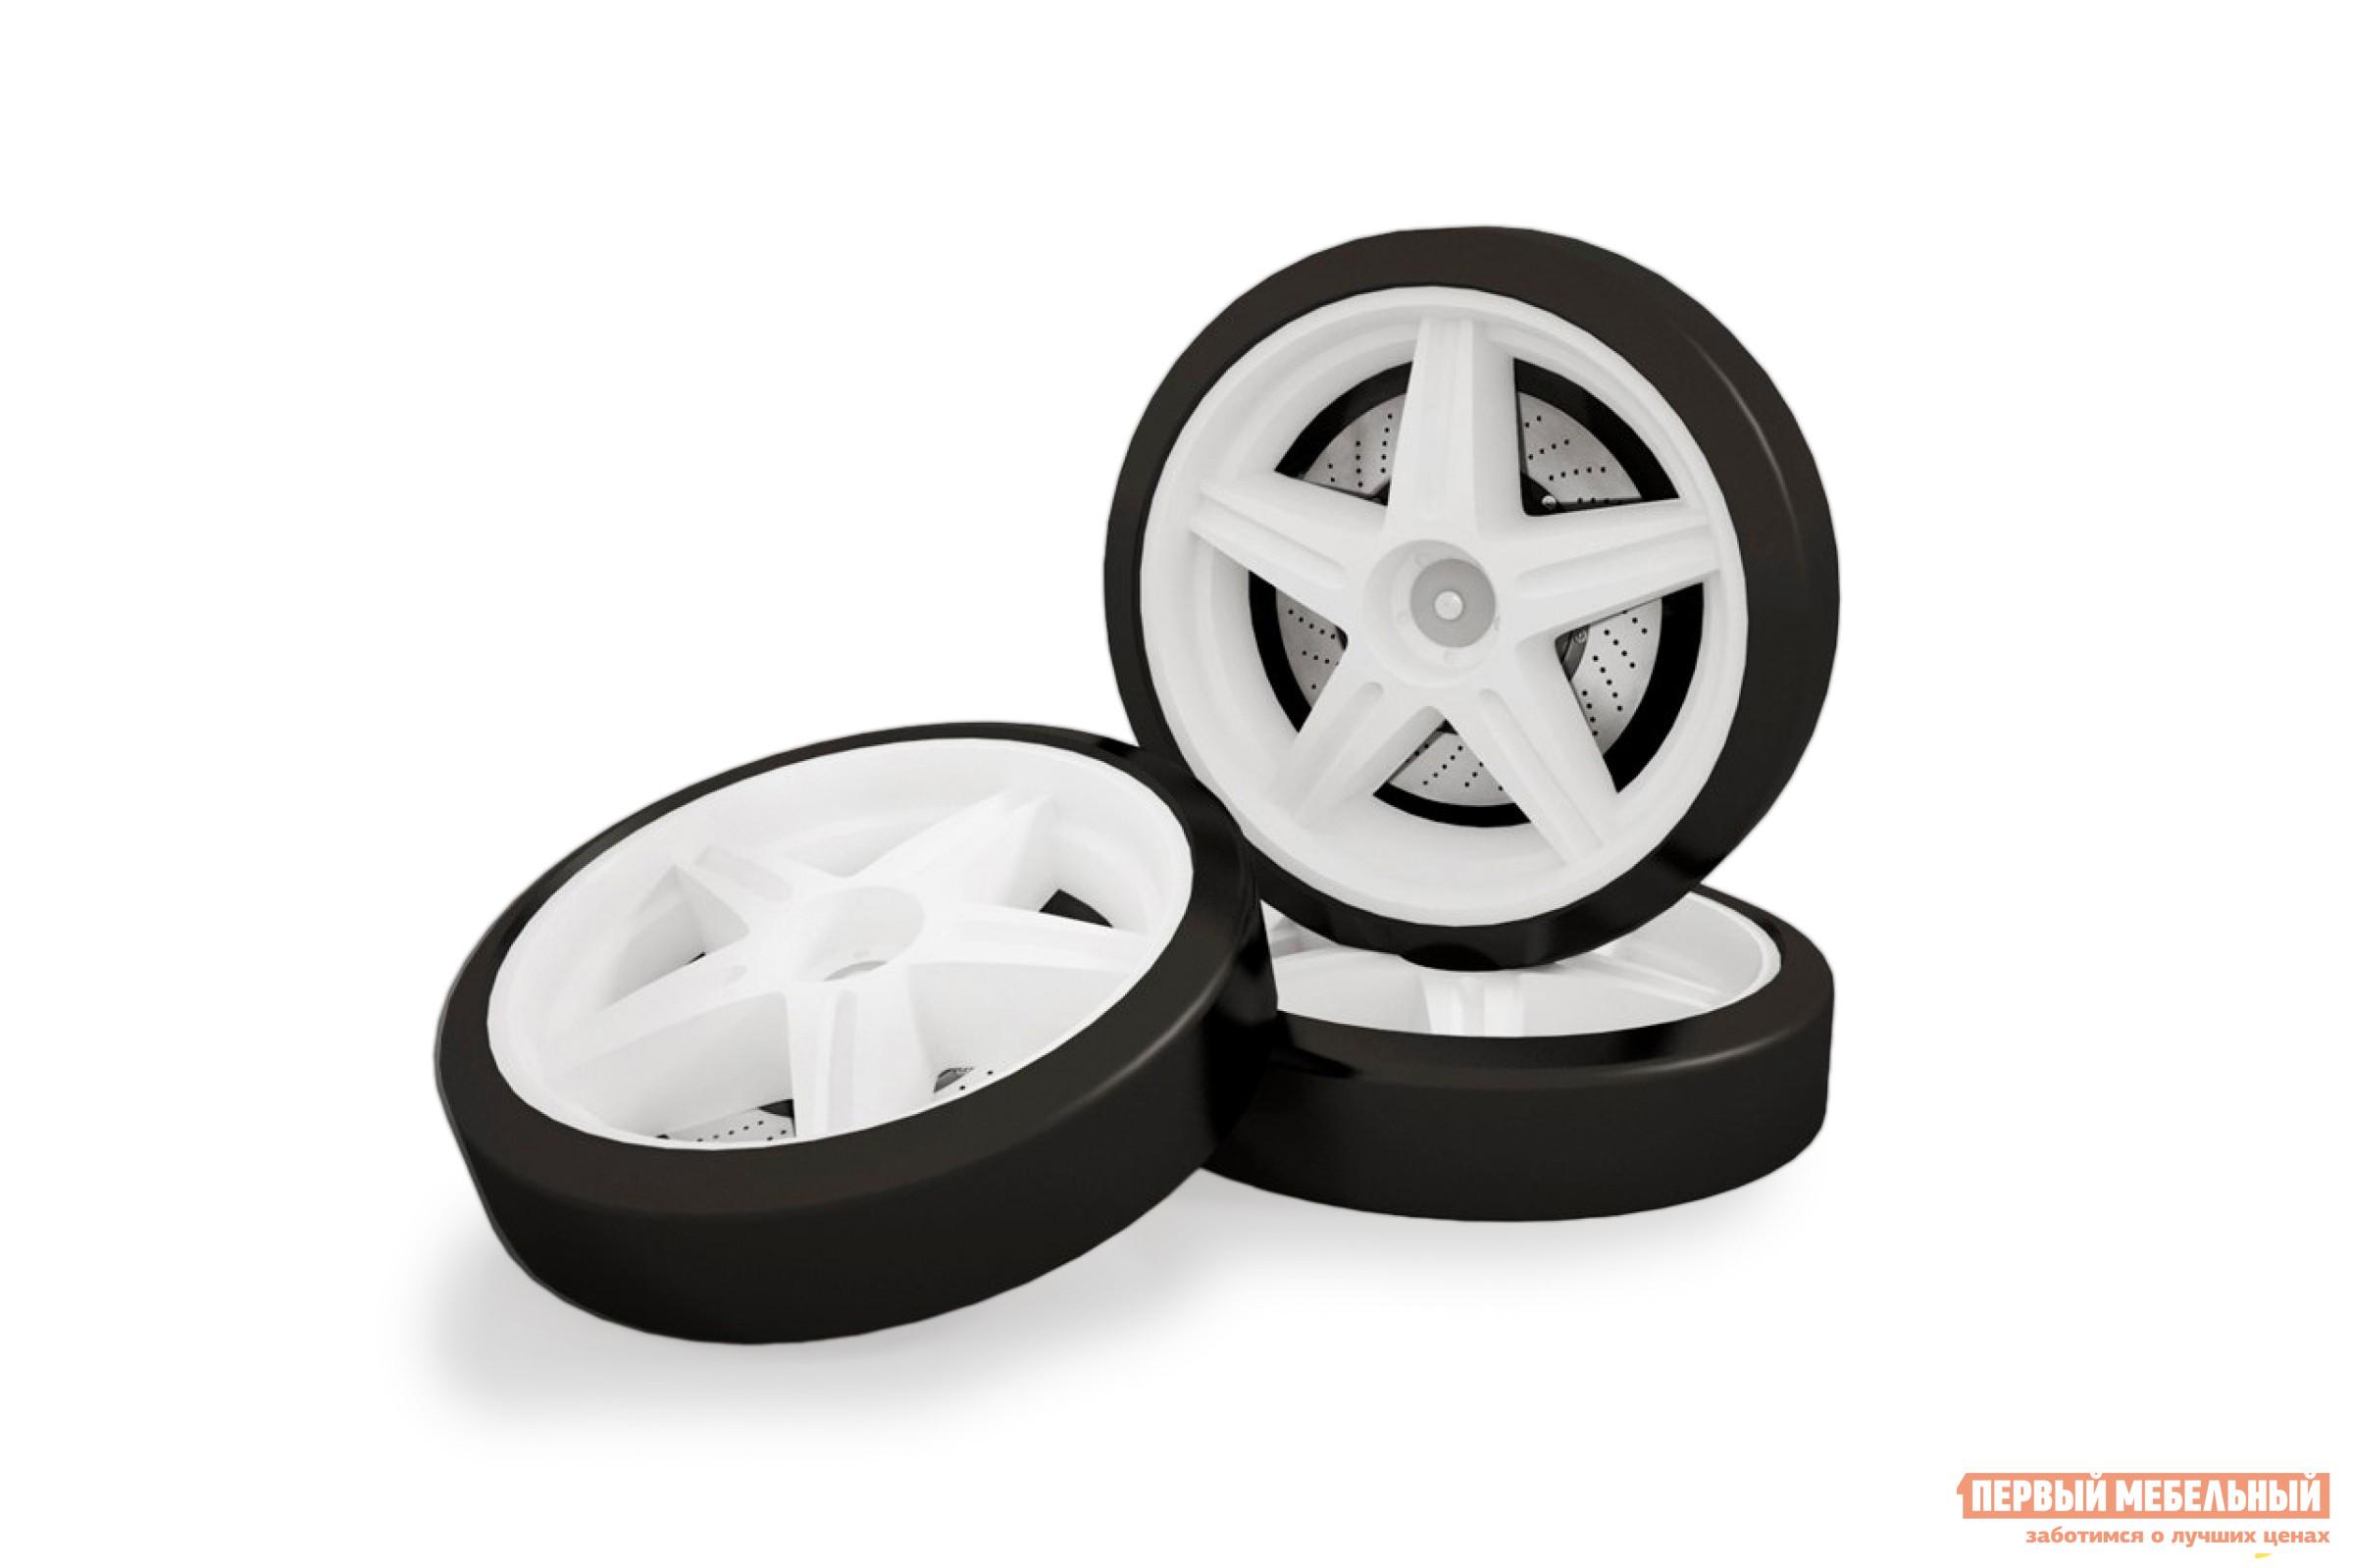 Аксессуар Bed-mobile Накладные колеса с дисками для БМВ/Мерседес/Мозерати, Ауди А6, 2 шт